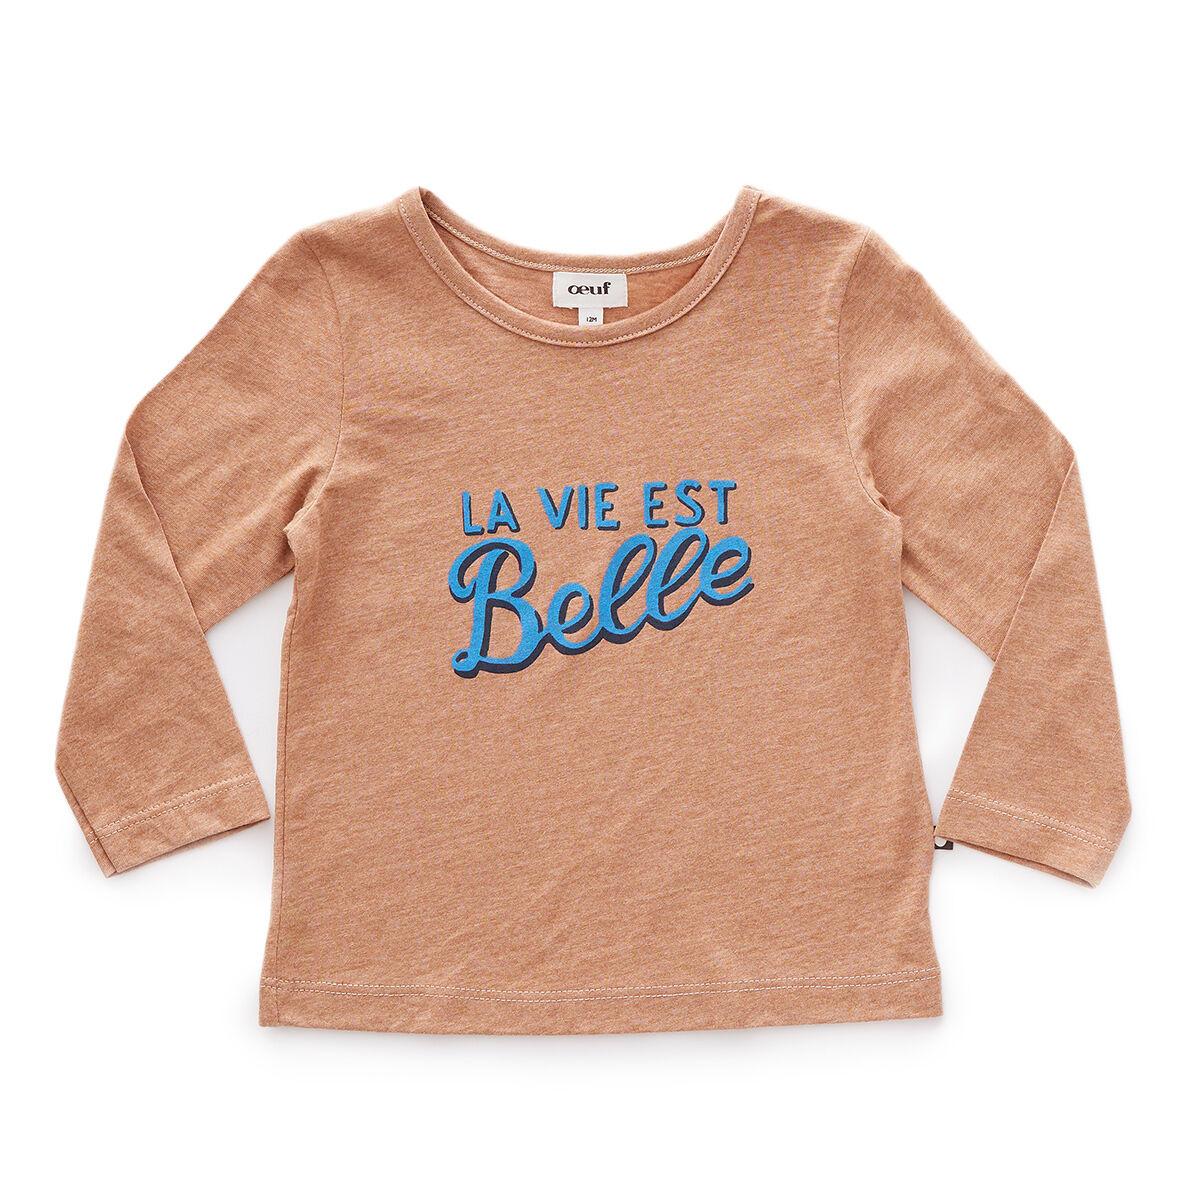 Oeuf NYC Tee-shirt La Vie Est Belle Marron - 6 Mois